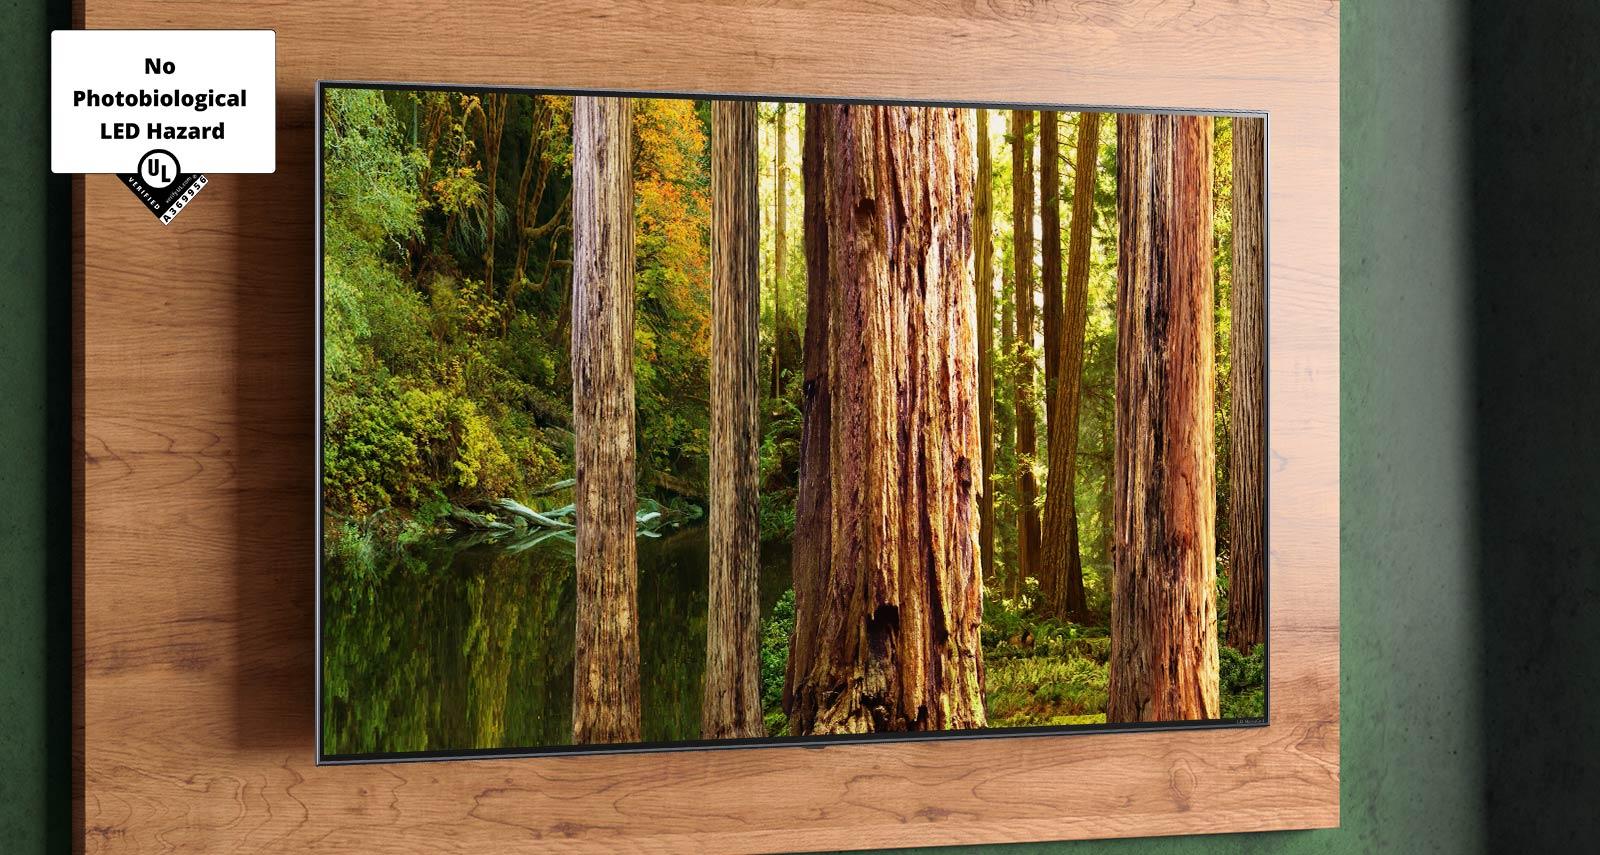 La imagen del bosque en la pantalla del TV